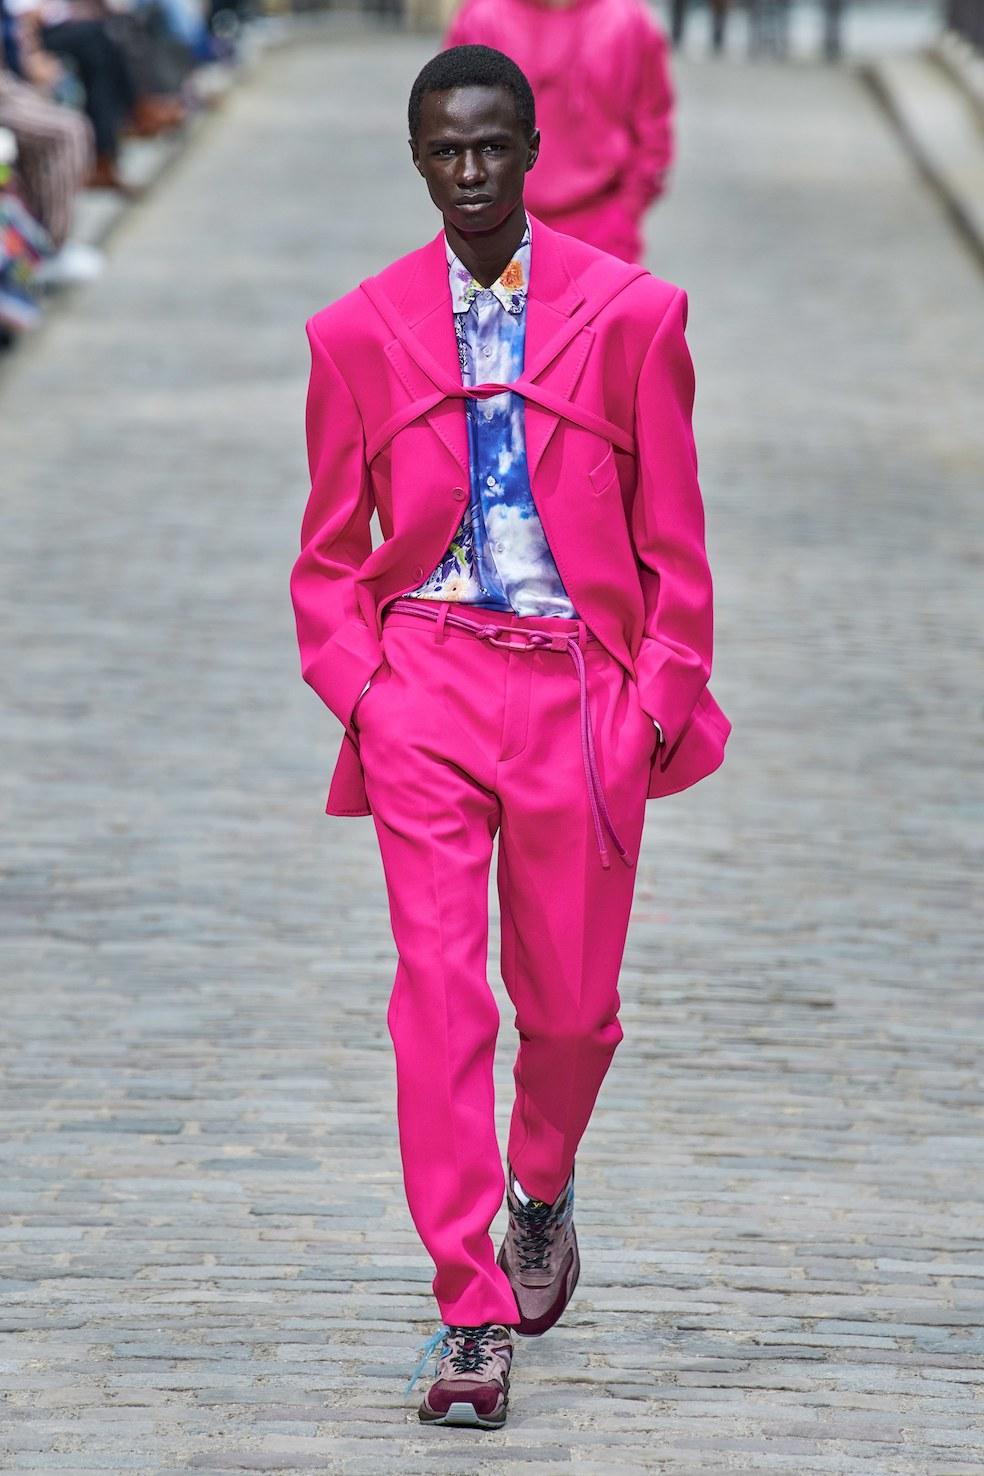 Louis_Vuitton_SS20_Behind_The_Blinds_Magazine__FIO0296.jpg